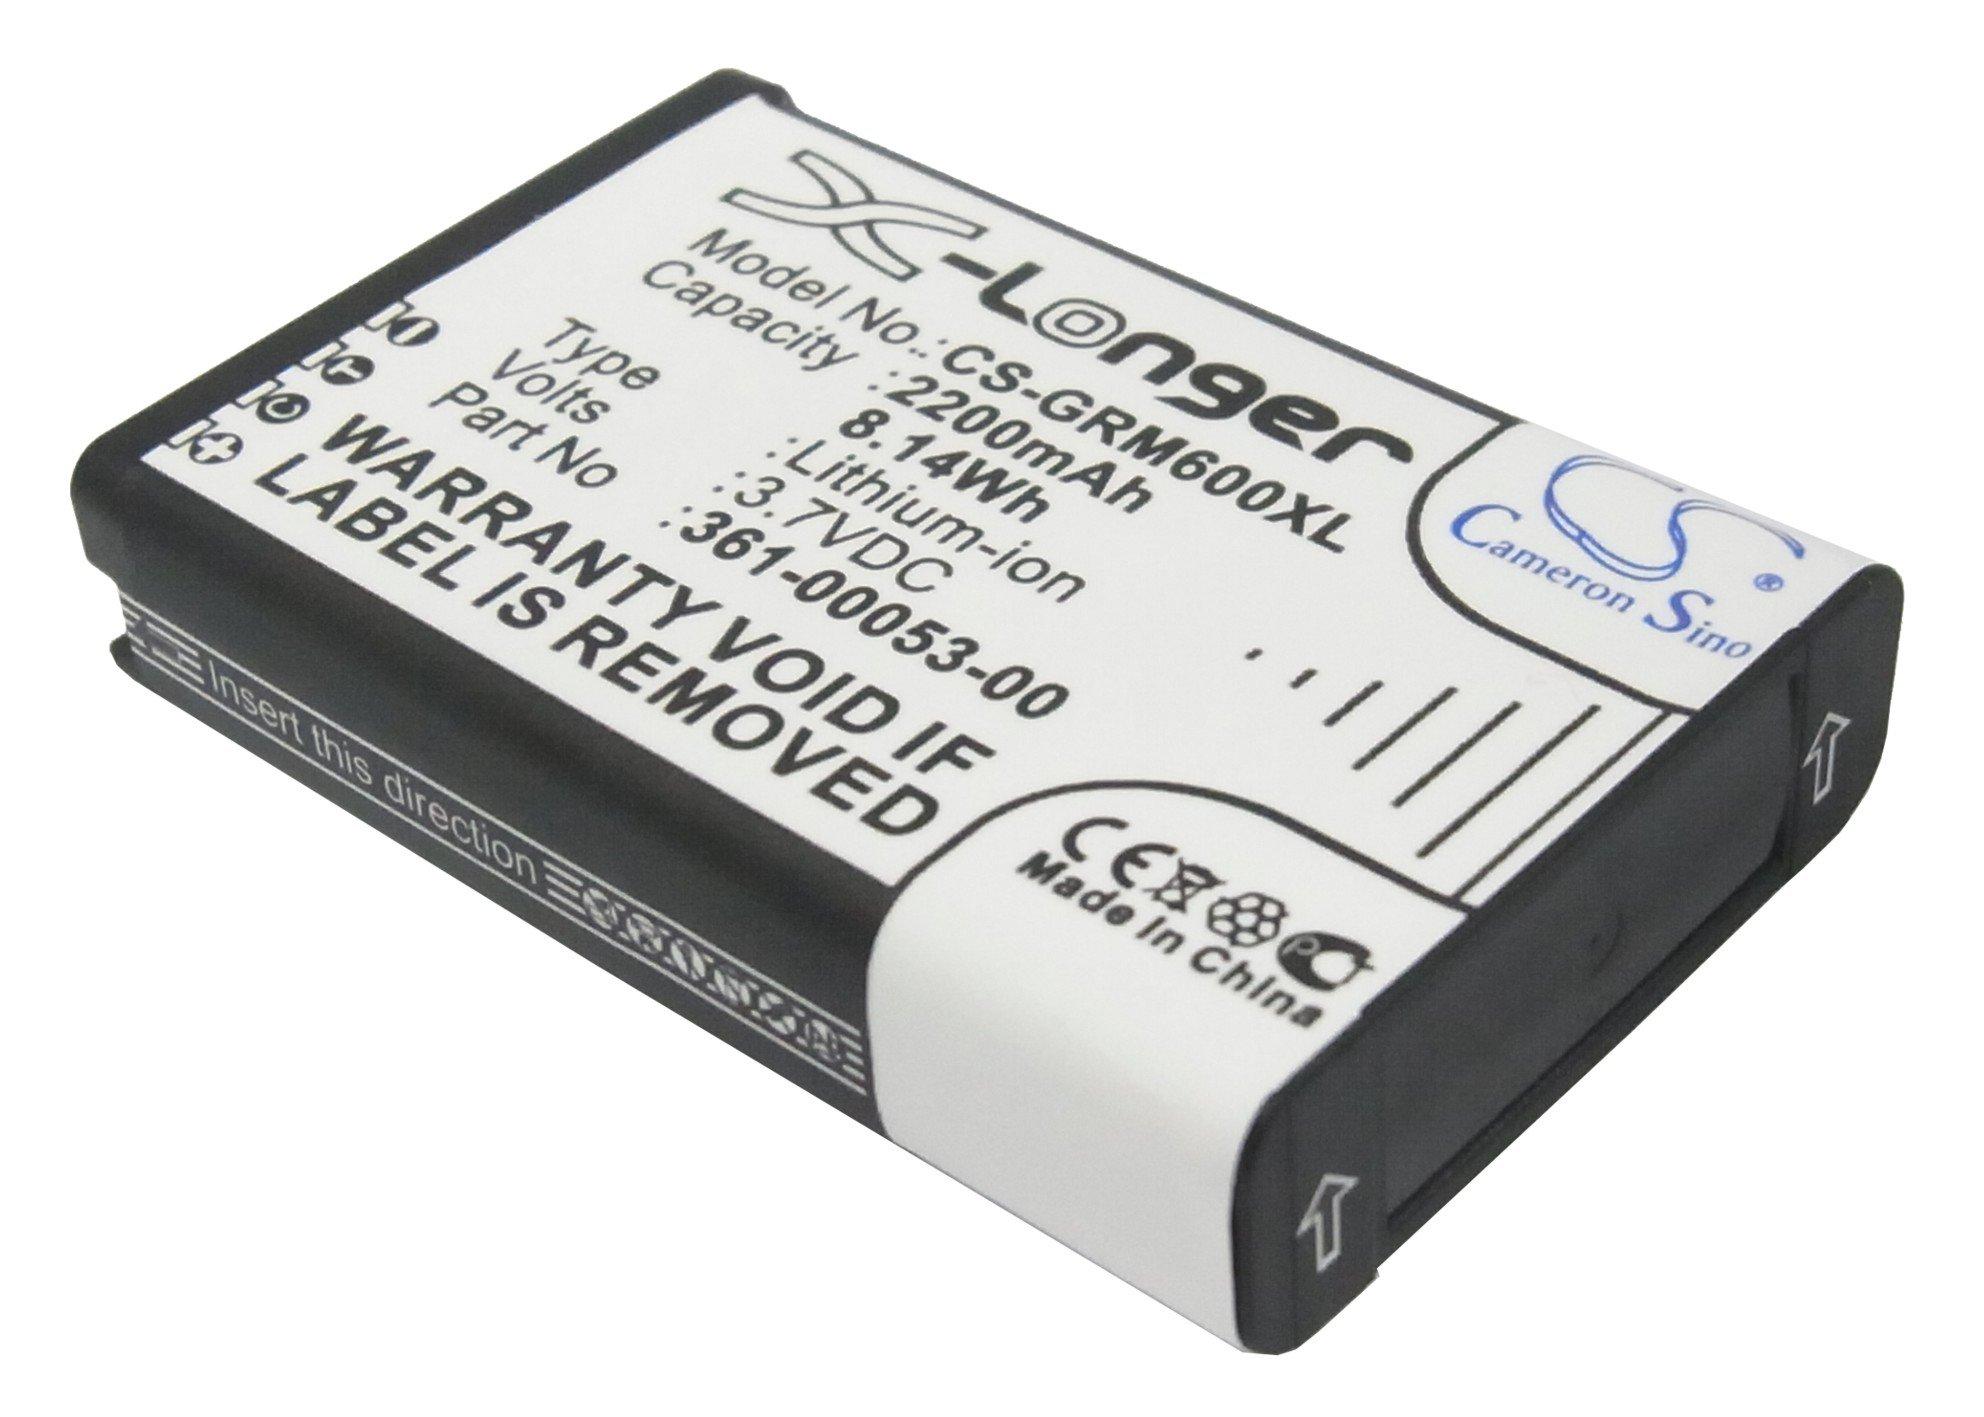 VinTrons 361-00053-00 Replacement Extended Battery for Garmin Alpha 100 handheld, Monterra